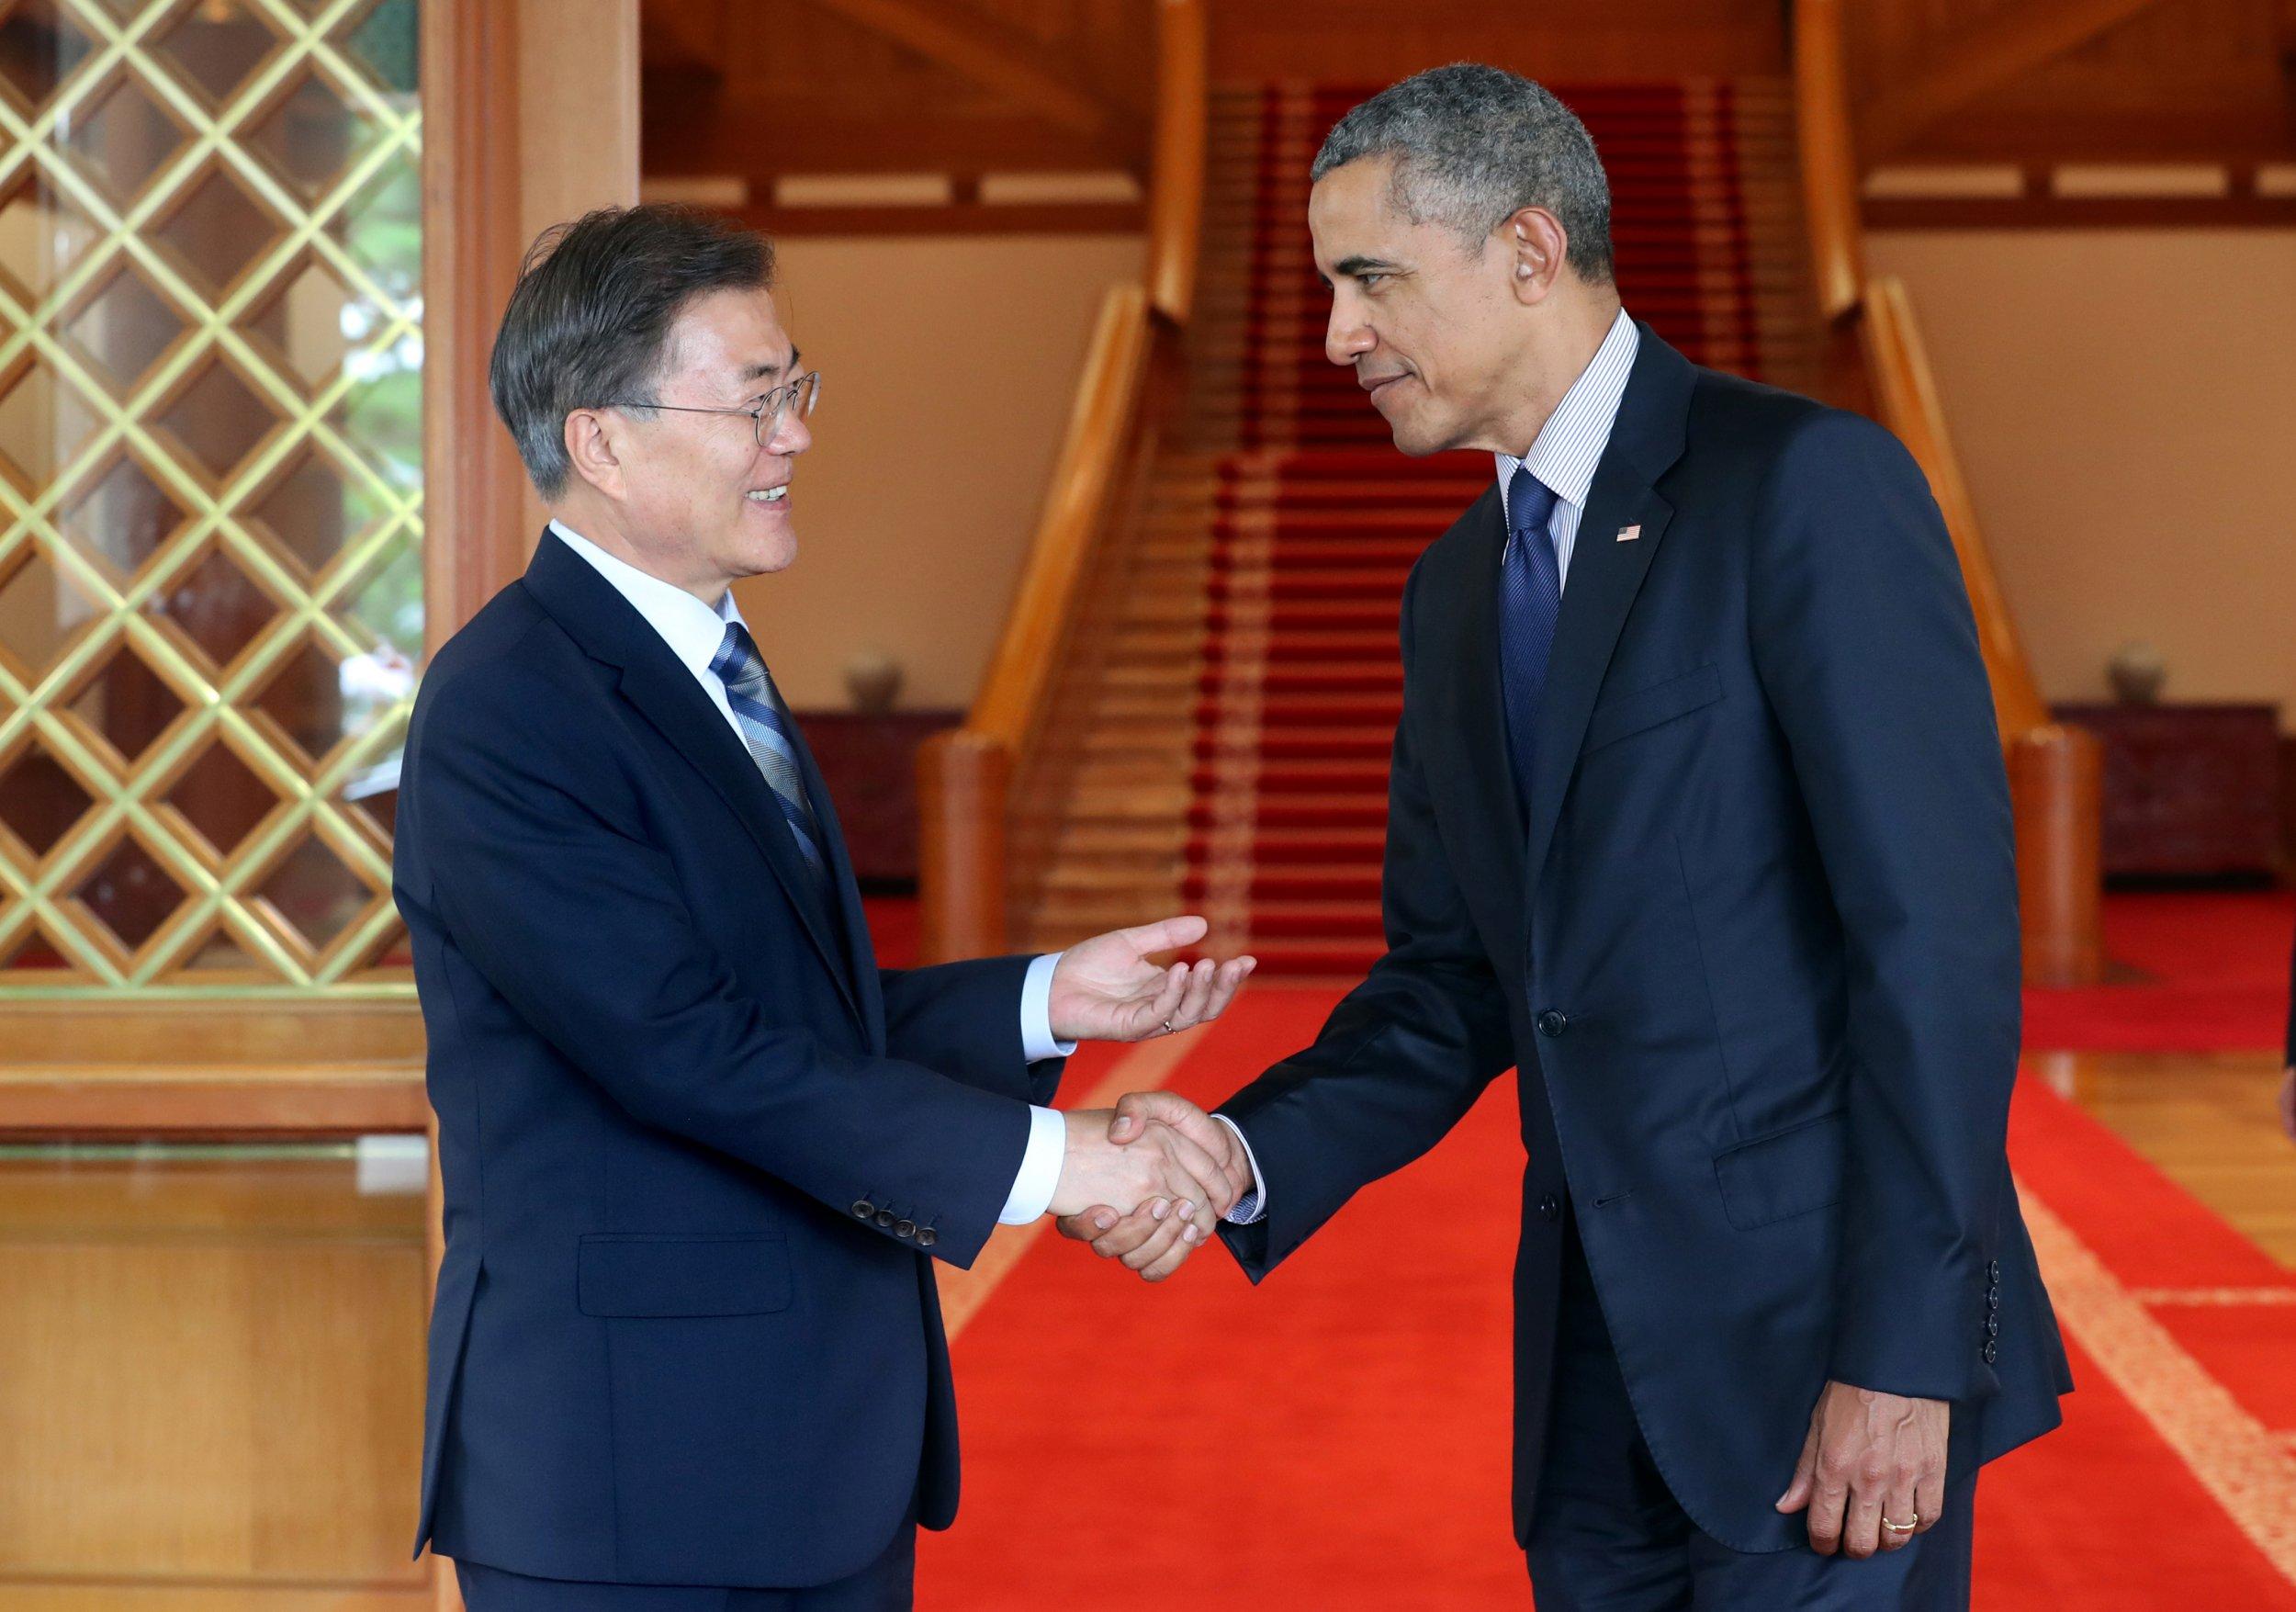 Obama in seoul north korea has one last chance to engage with the obama in seoul north korea has one last chance to engage with the west m4hsunfo